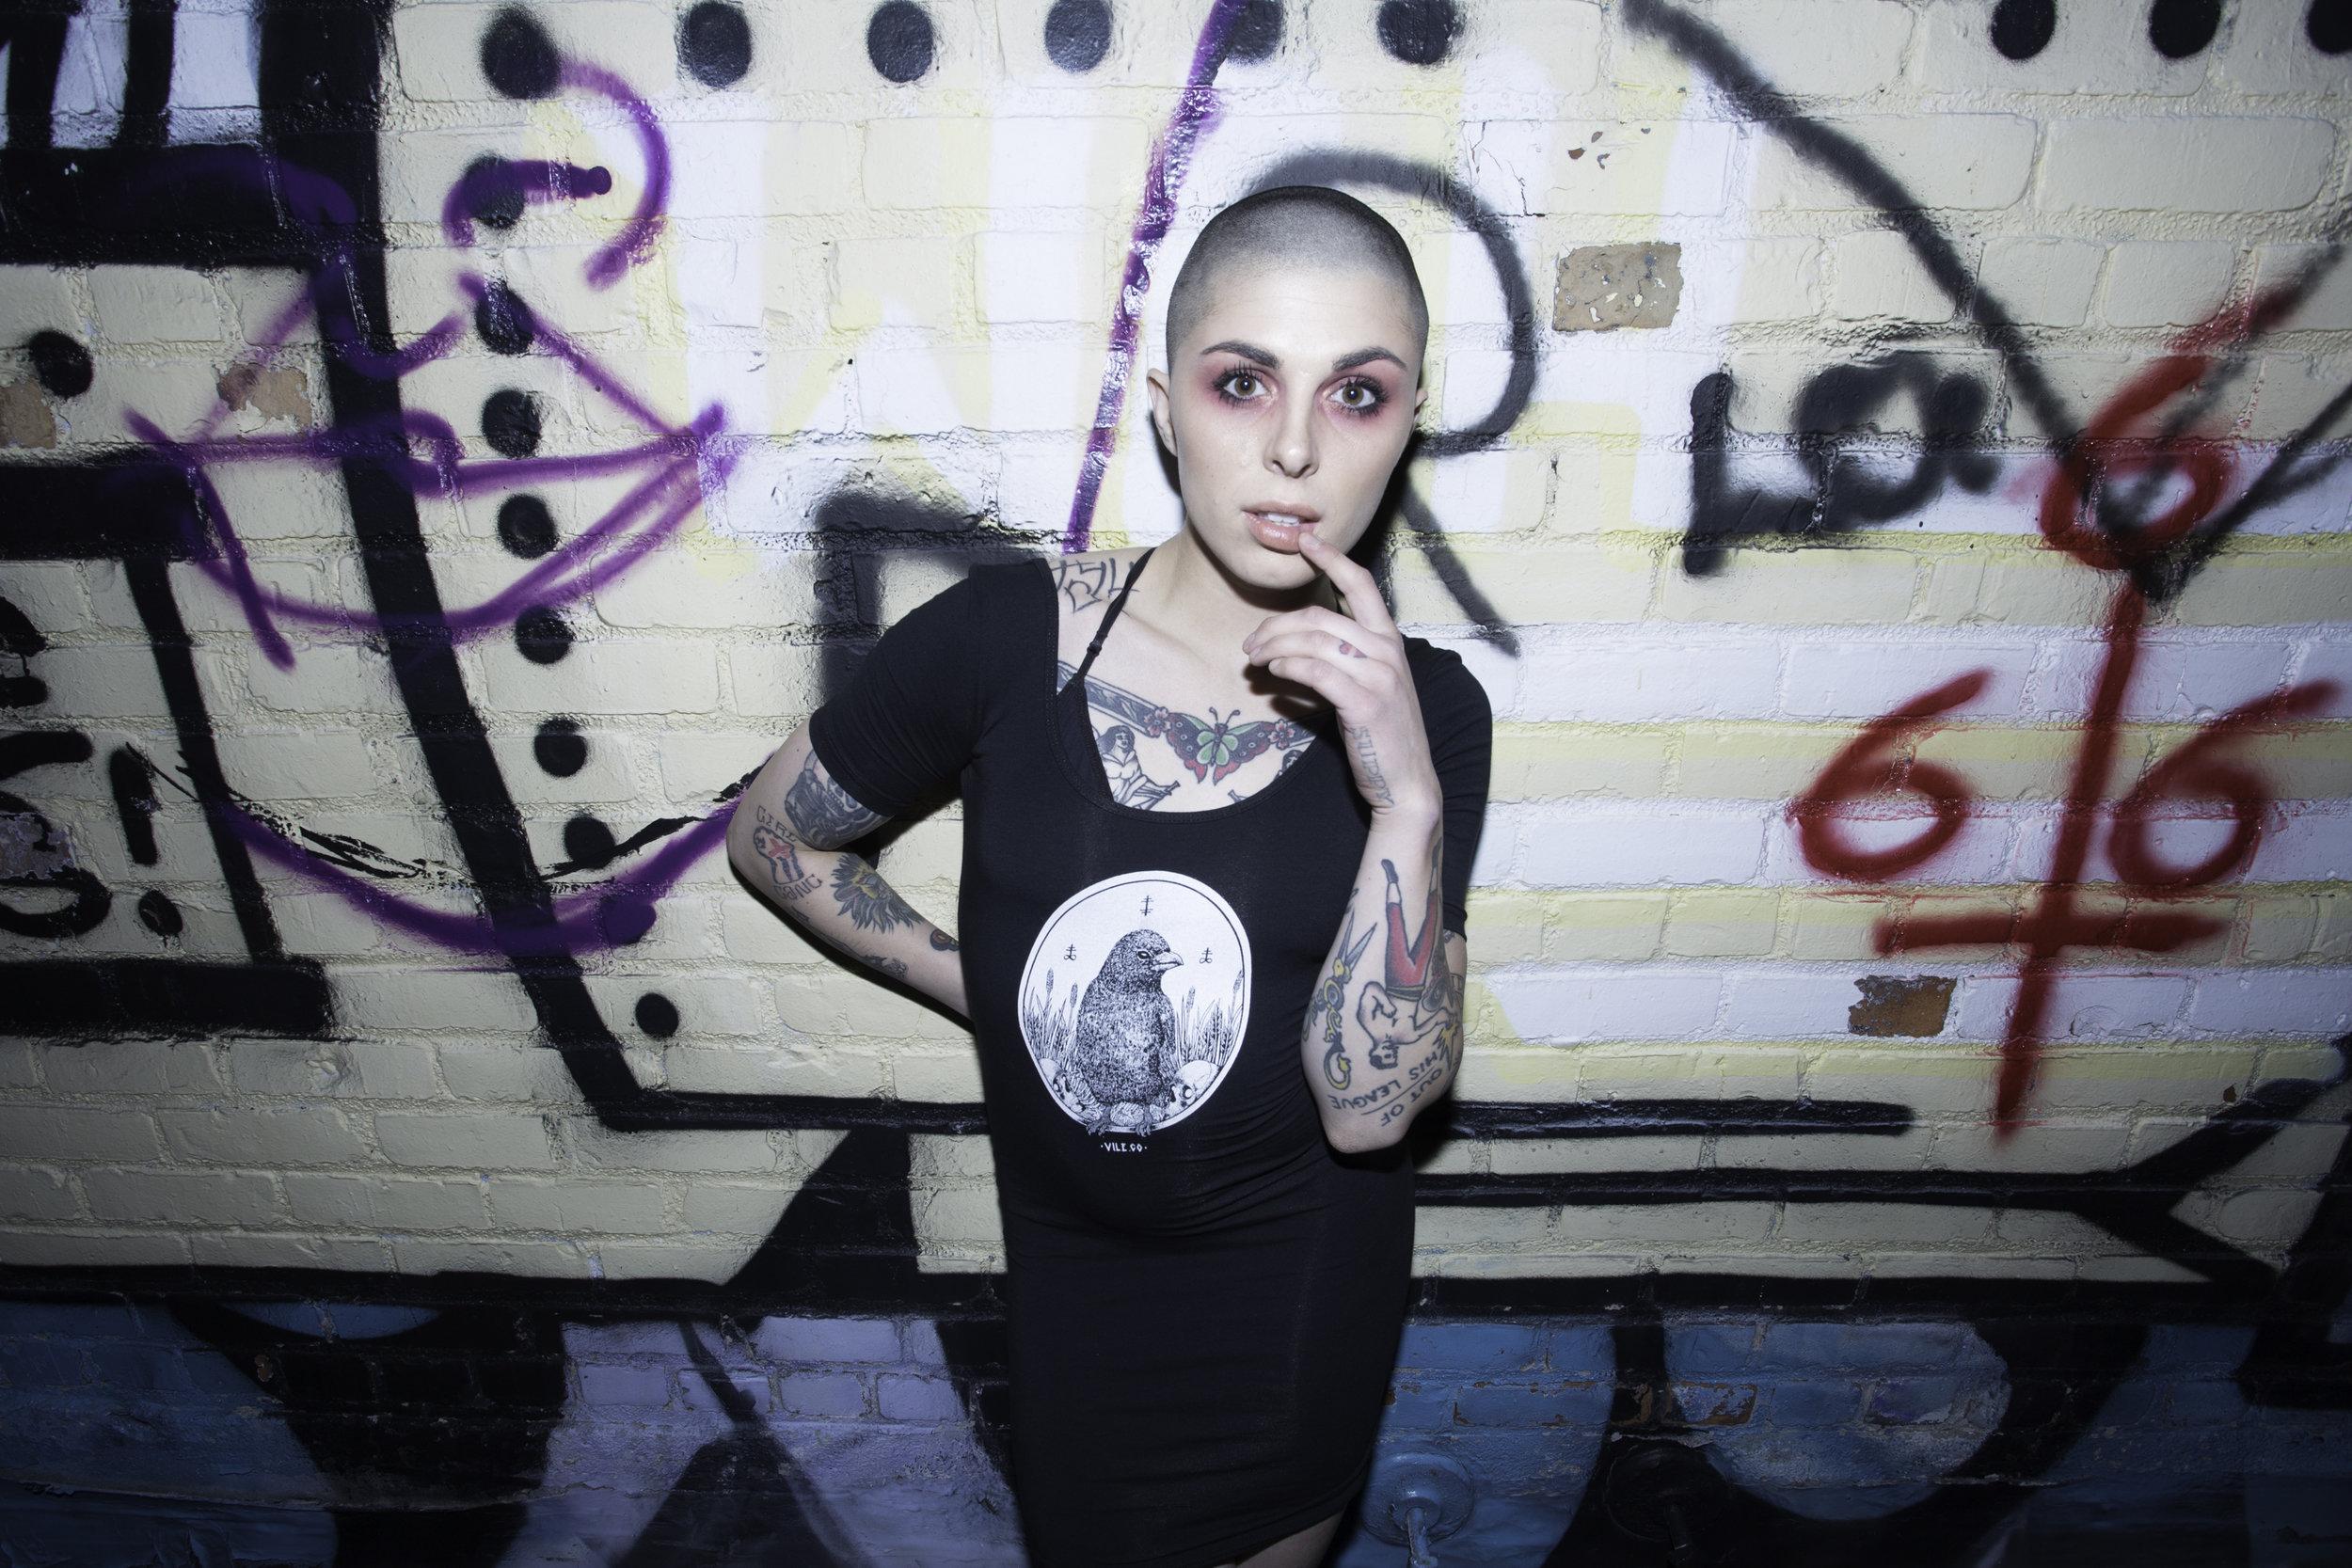 kirby_nevermore_dress_edit1_vile_vileco_vilegirls_girlsofvilecompany_vilecompany_detroit.jpg